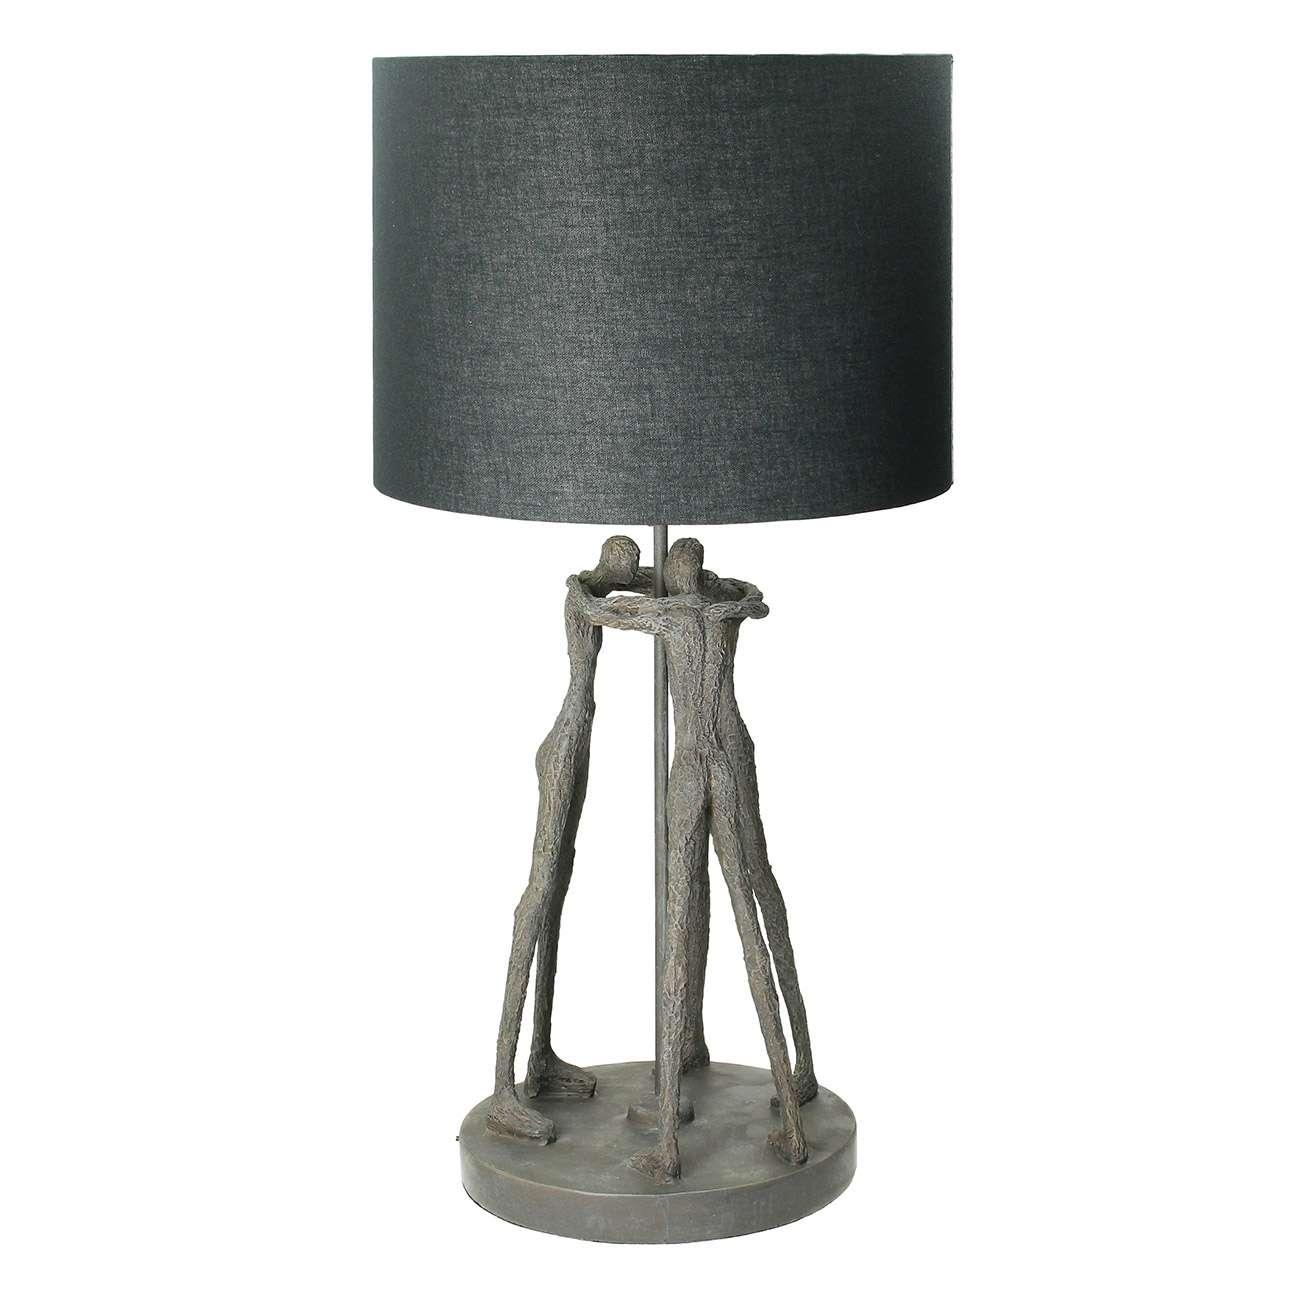 Tischlampe Cali 70cm